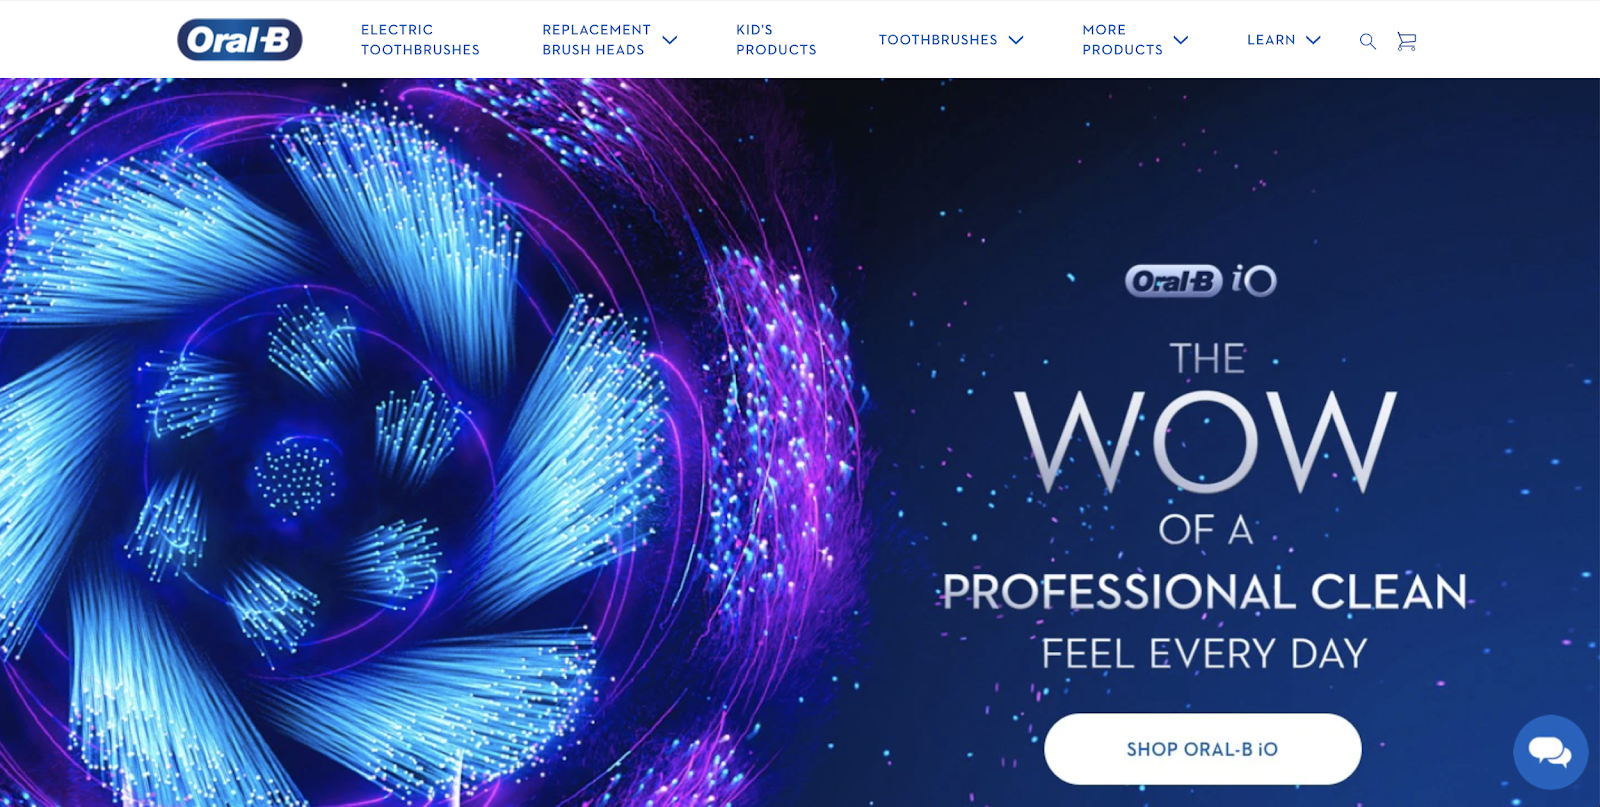 oral b website homepage with dark blue background